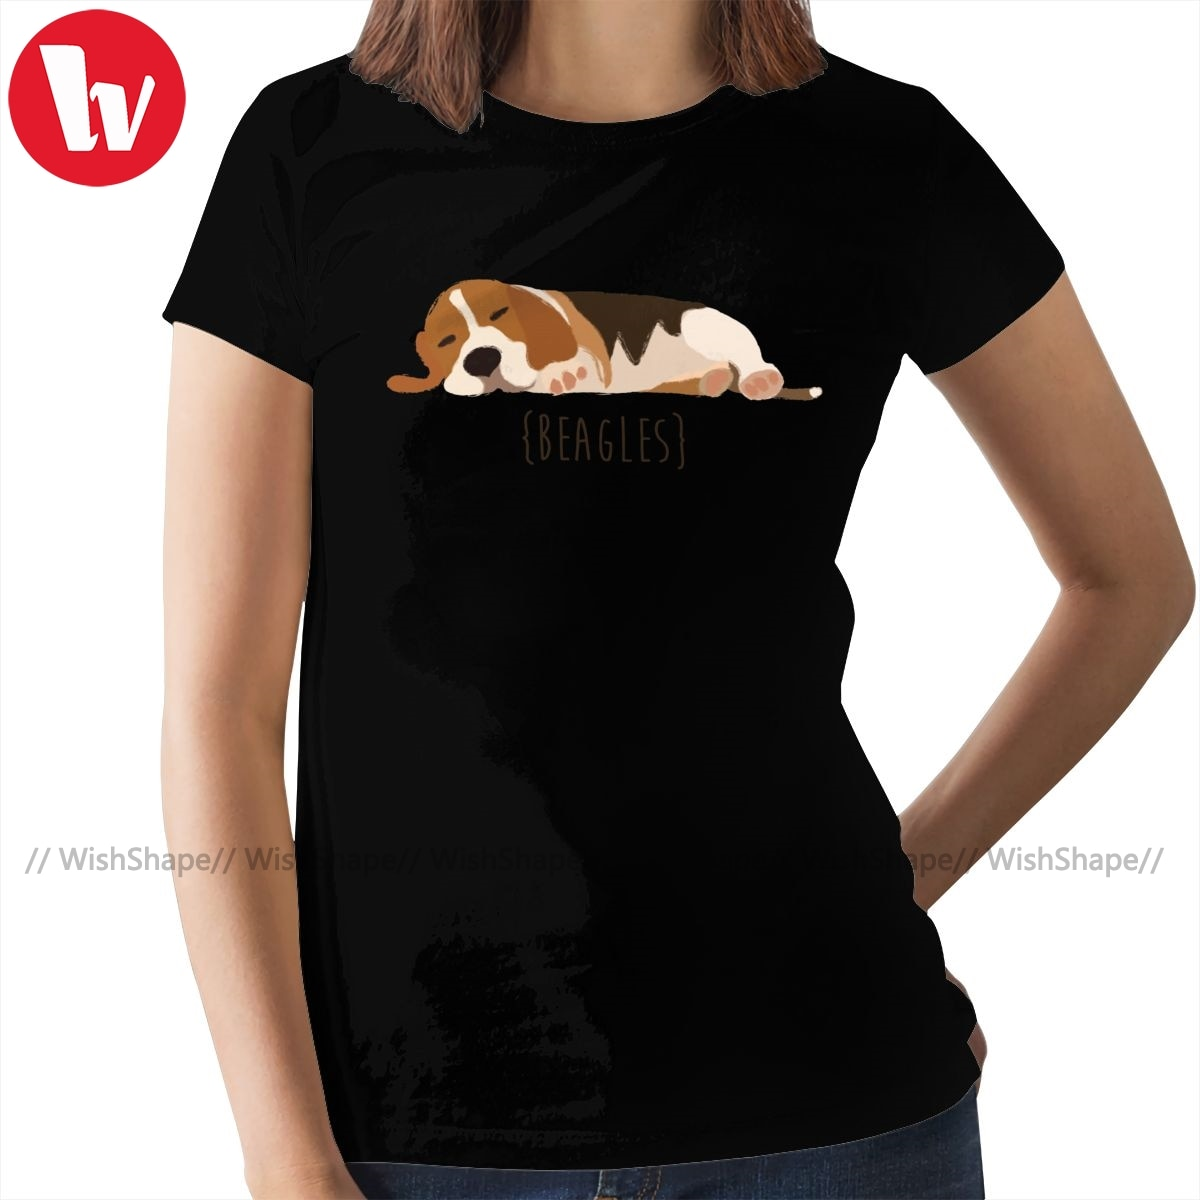 Beagle Puppy T-Shirt Beagles T Shirt Short-Sleeve 100 Cotton Women tshirt Large Size Simple Ladies Tee Shirt